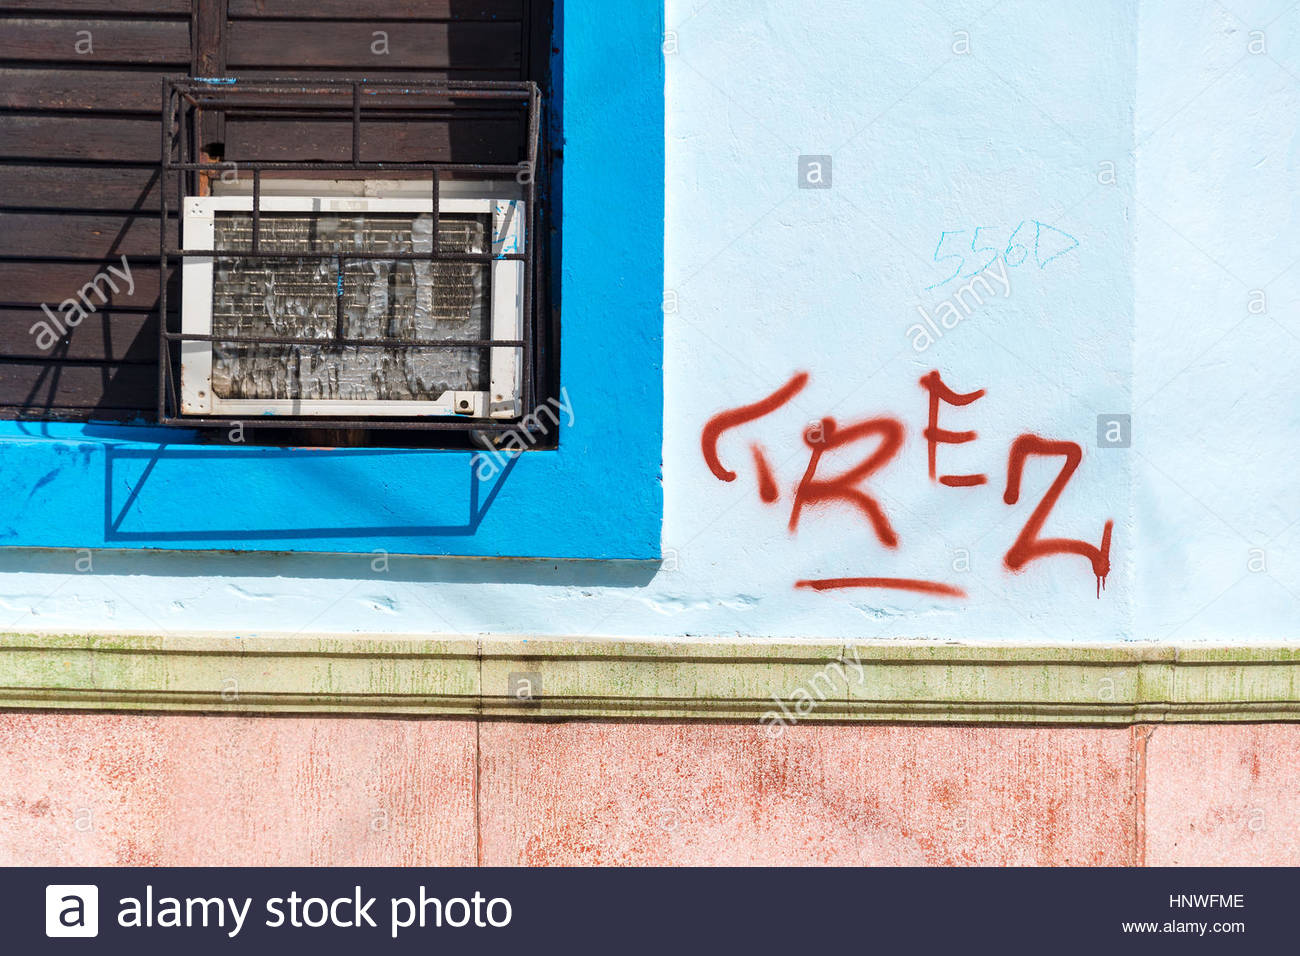 Socialist Graffiti Stock Photos & Socialist Graffiti Stock Images ...